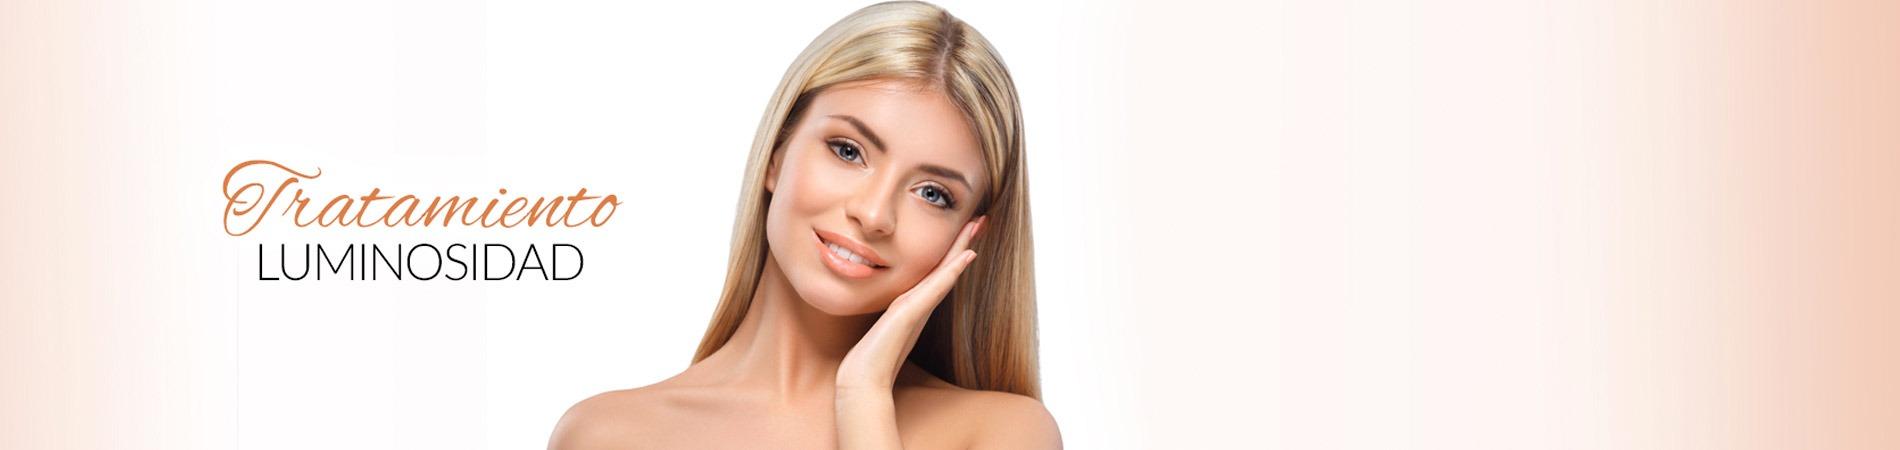 Tratamiento Luminosidad Facial RLR